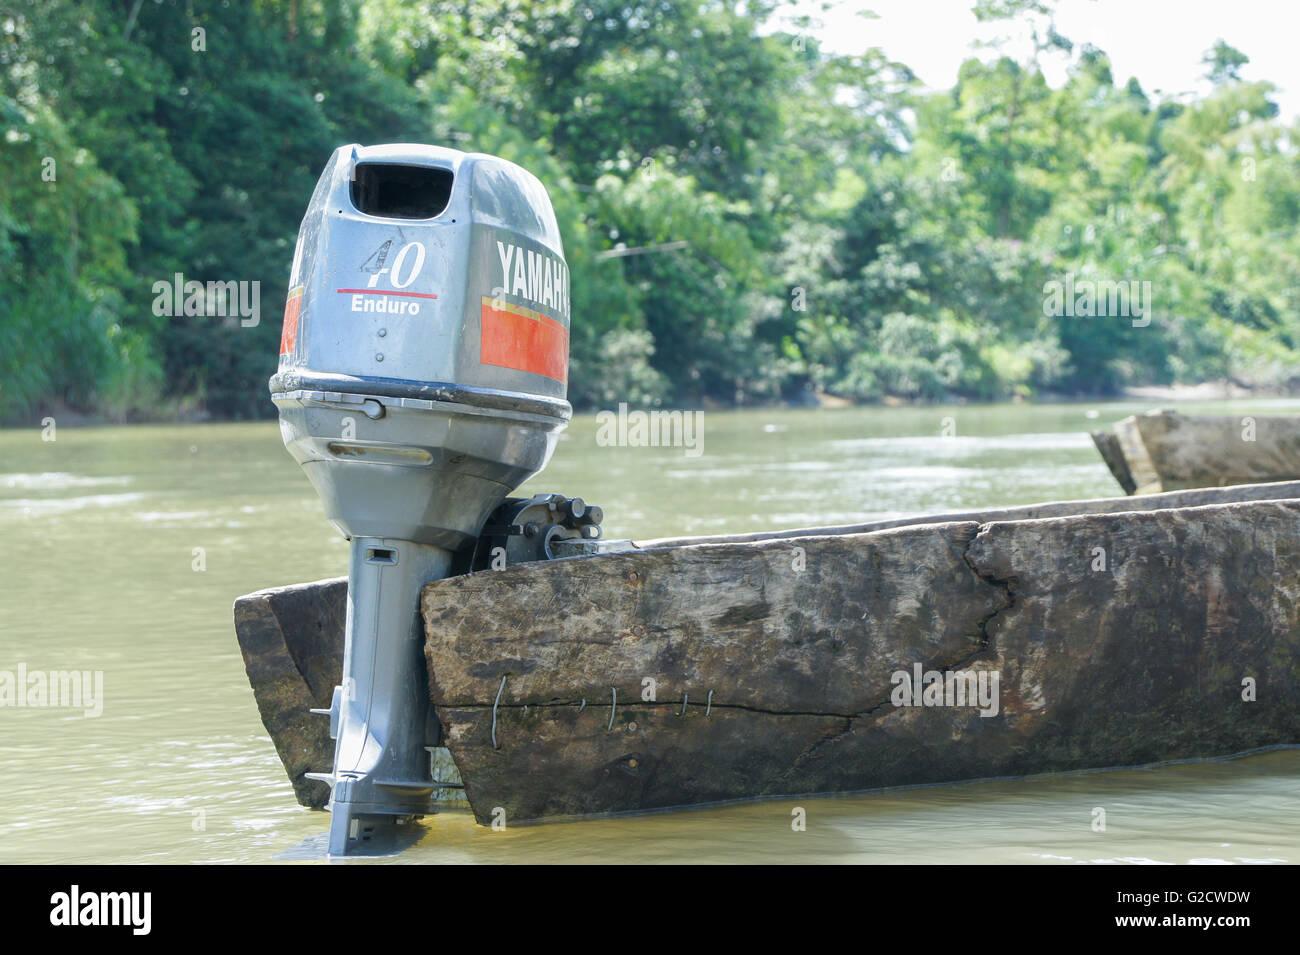 Motor canoe on the amazon river. - Stock Image